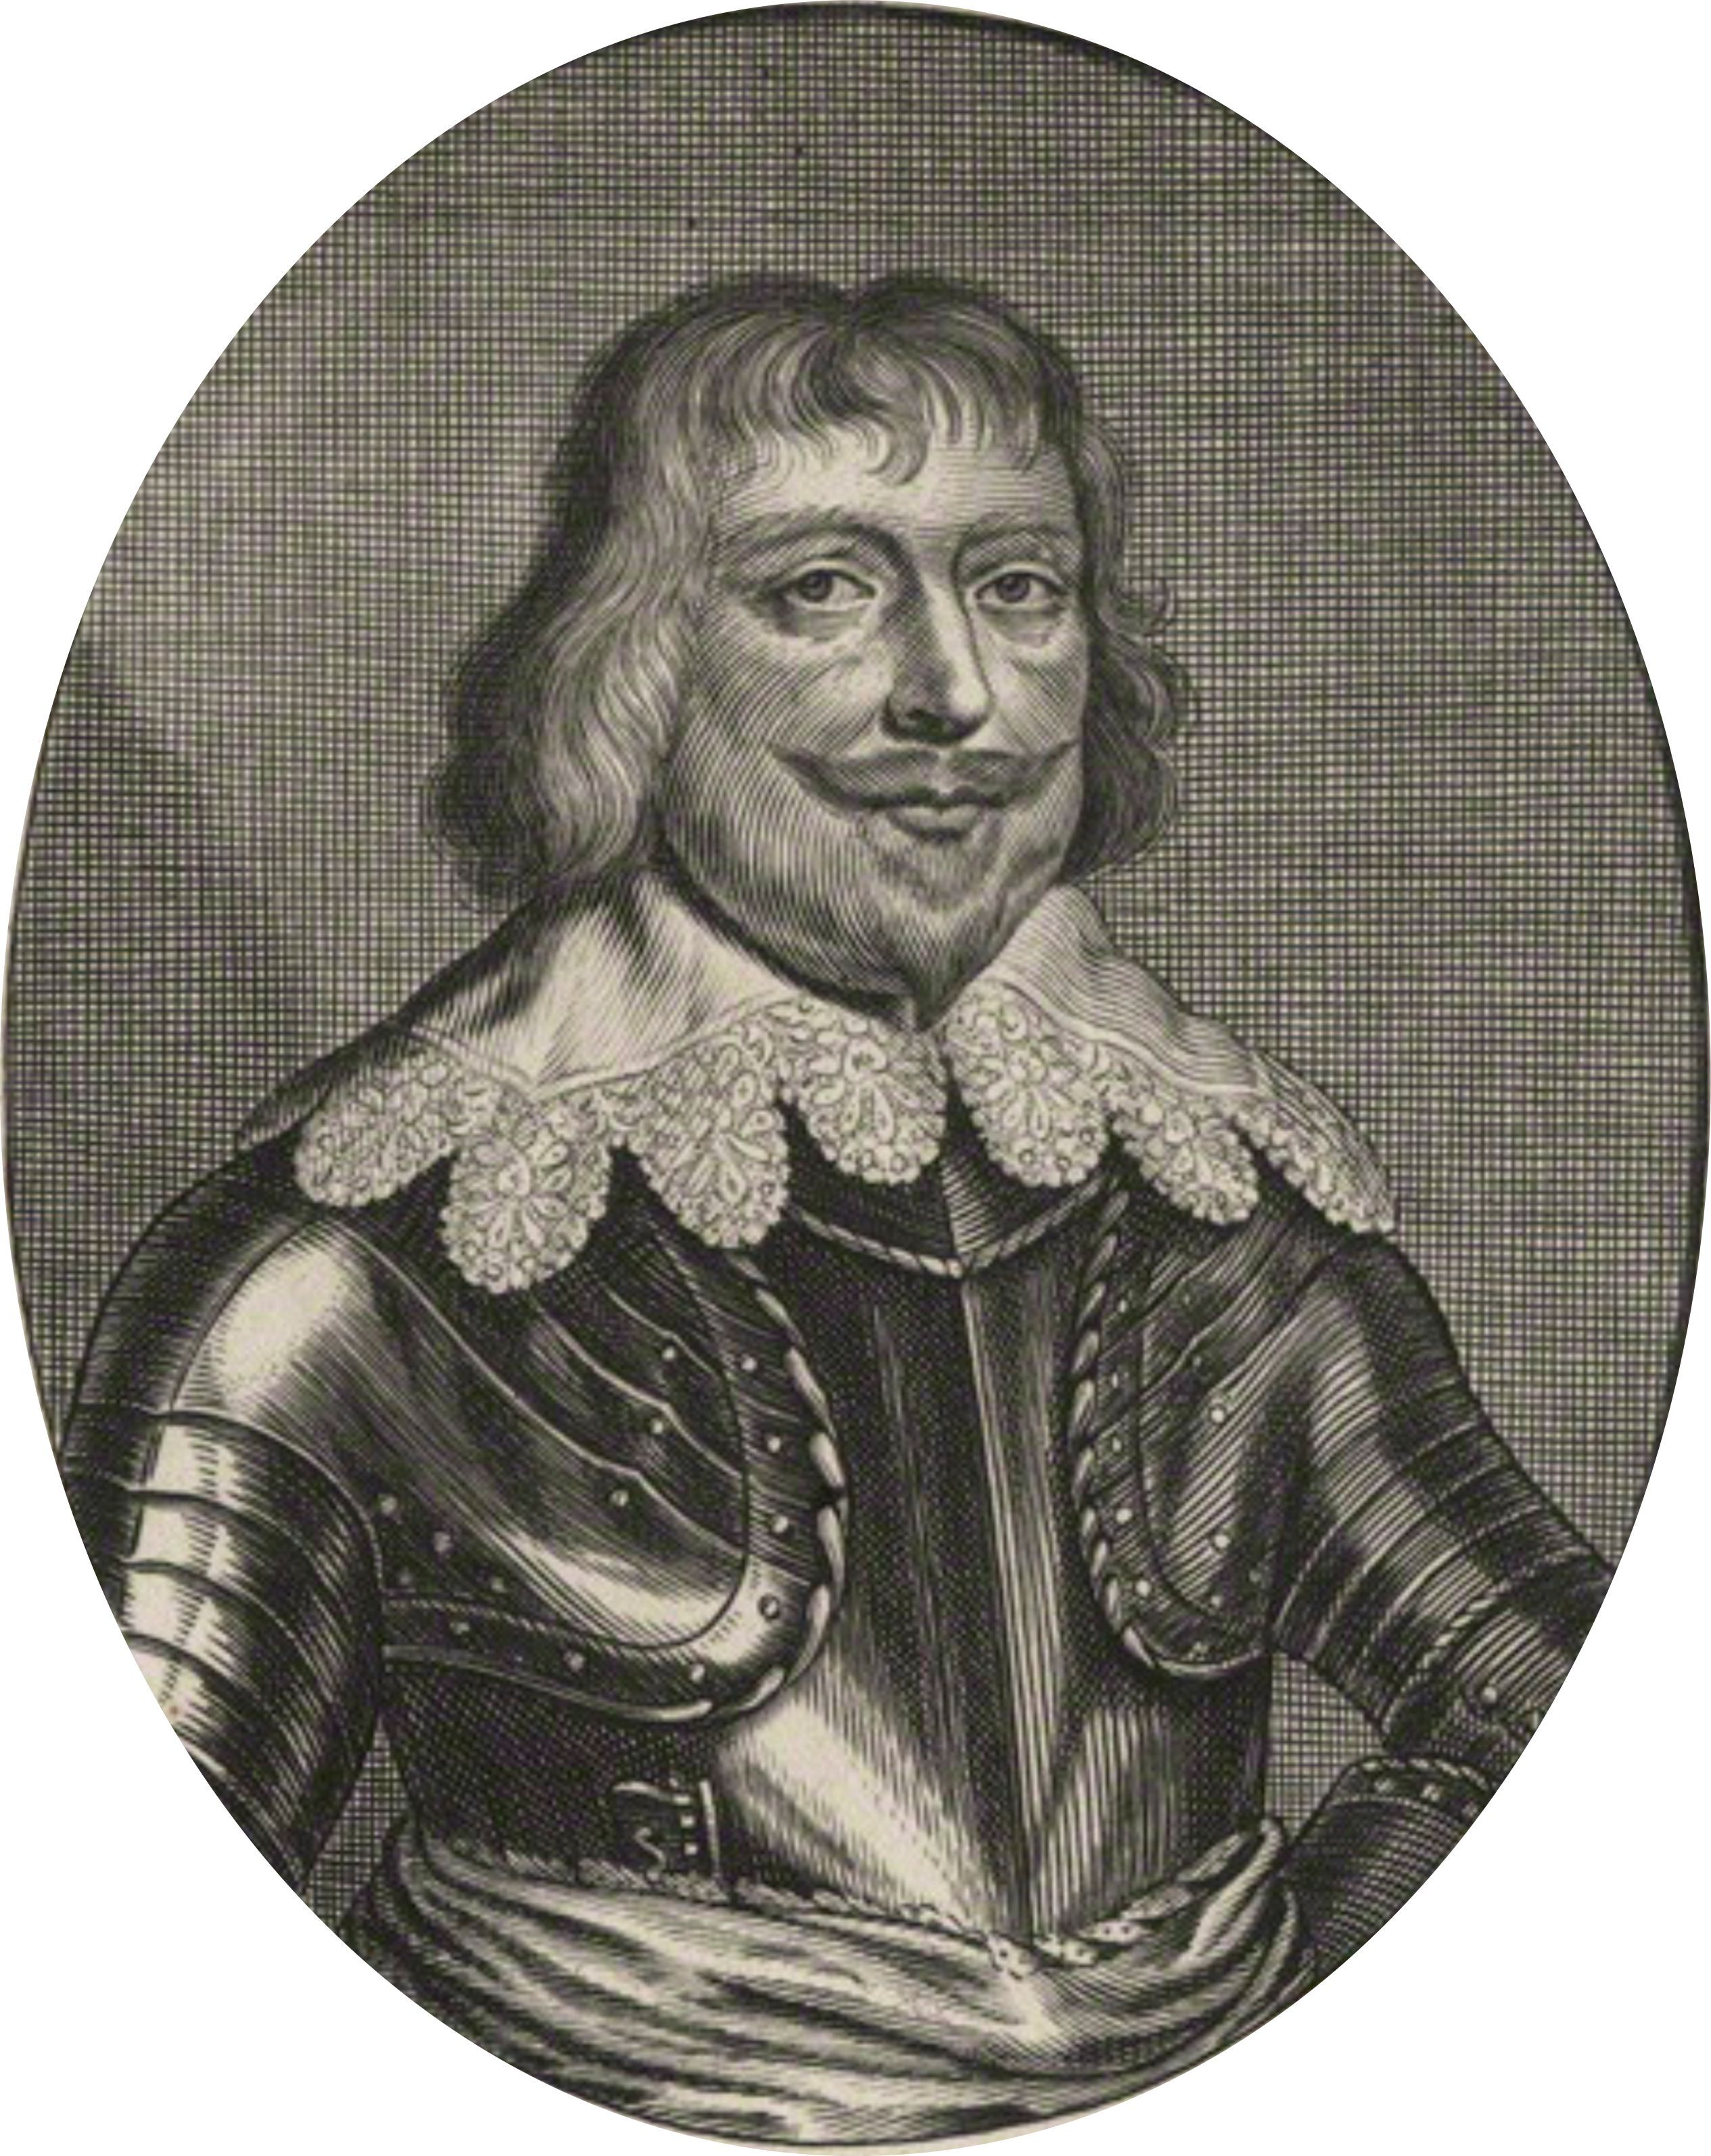 Robert_Devereux_3rd_Earl_of_Essex